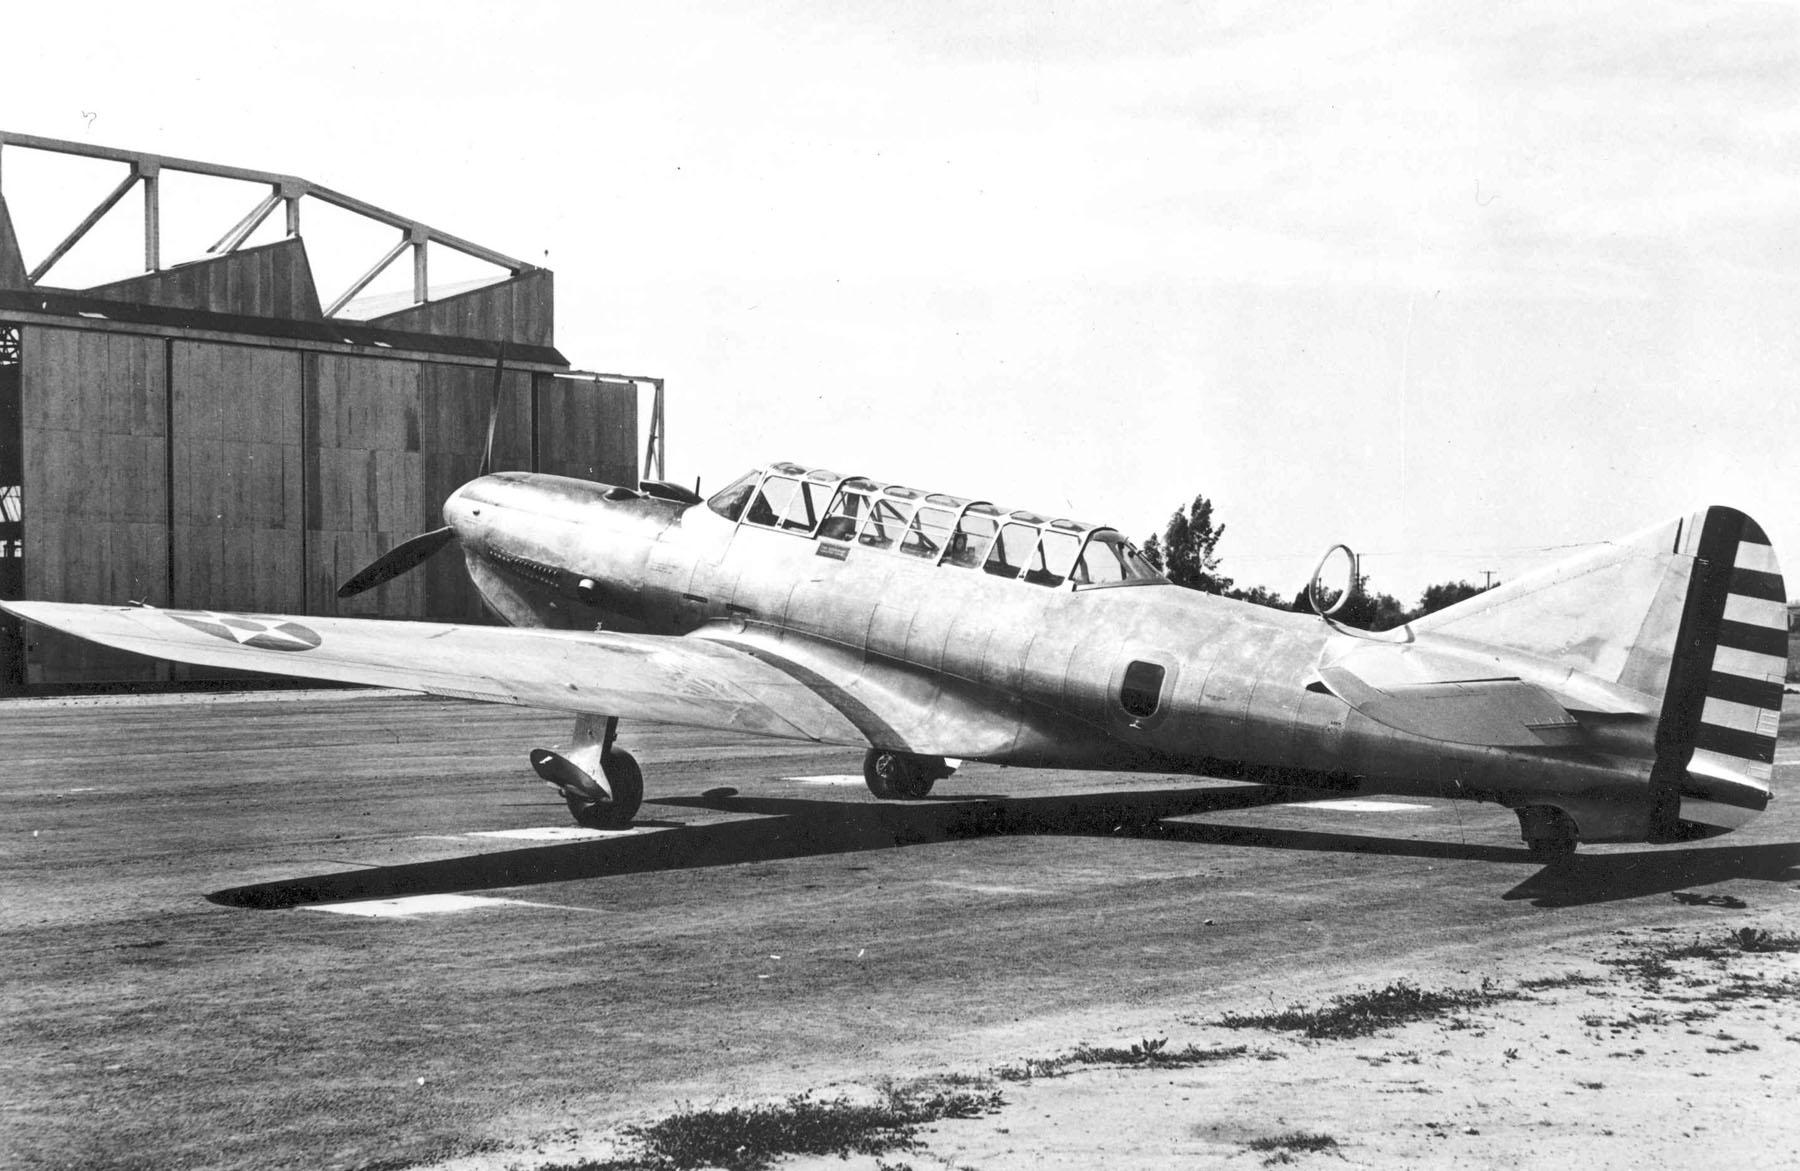 Vultee YA-19A